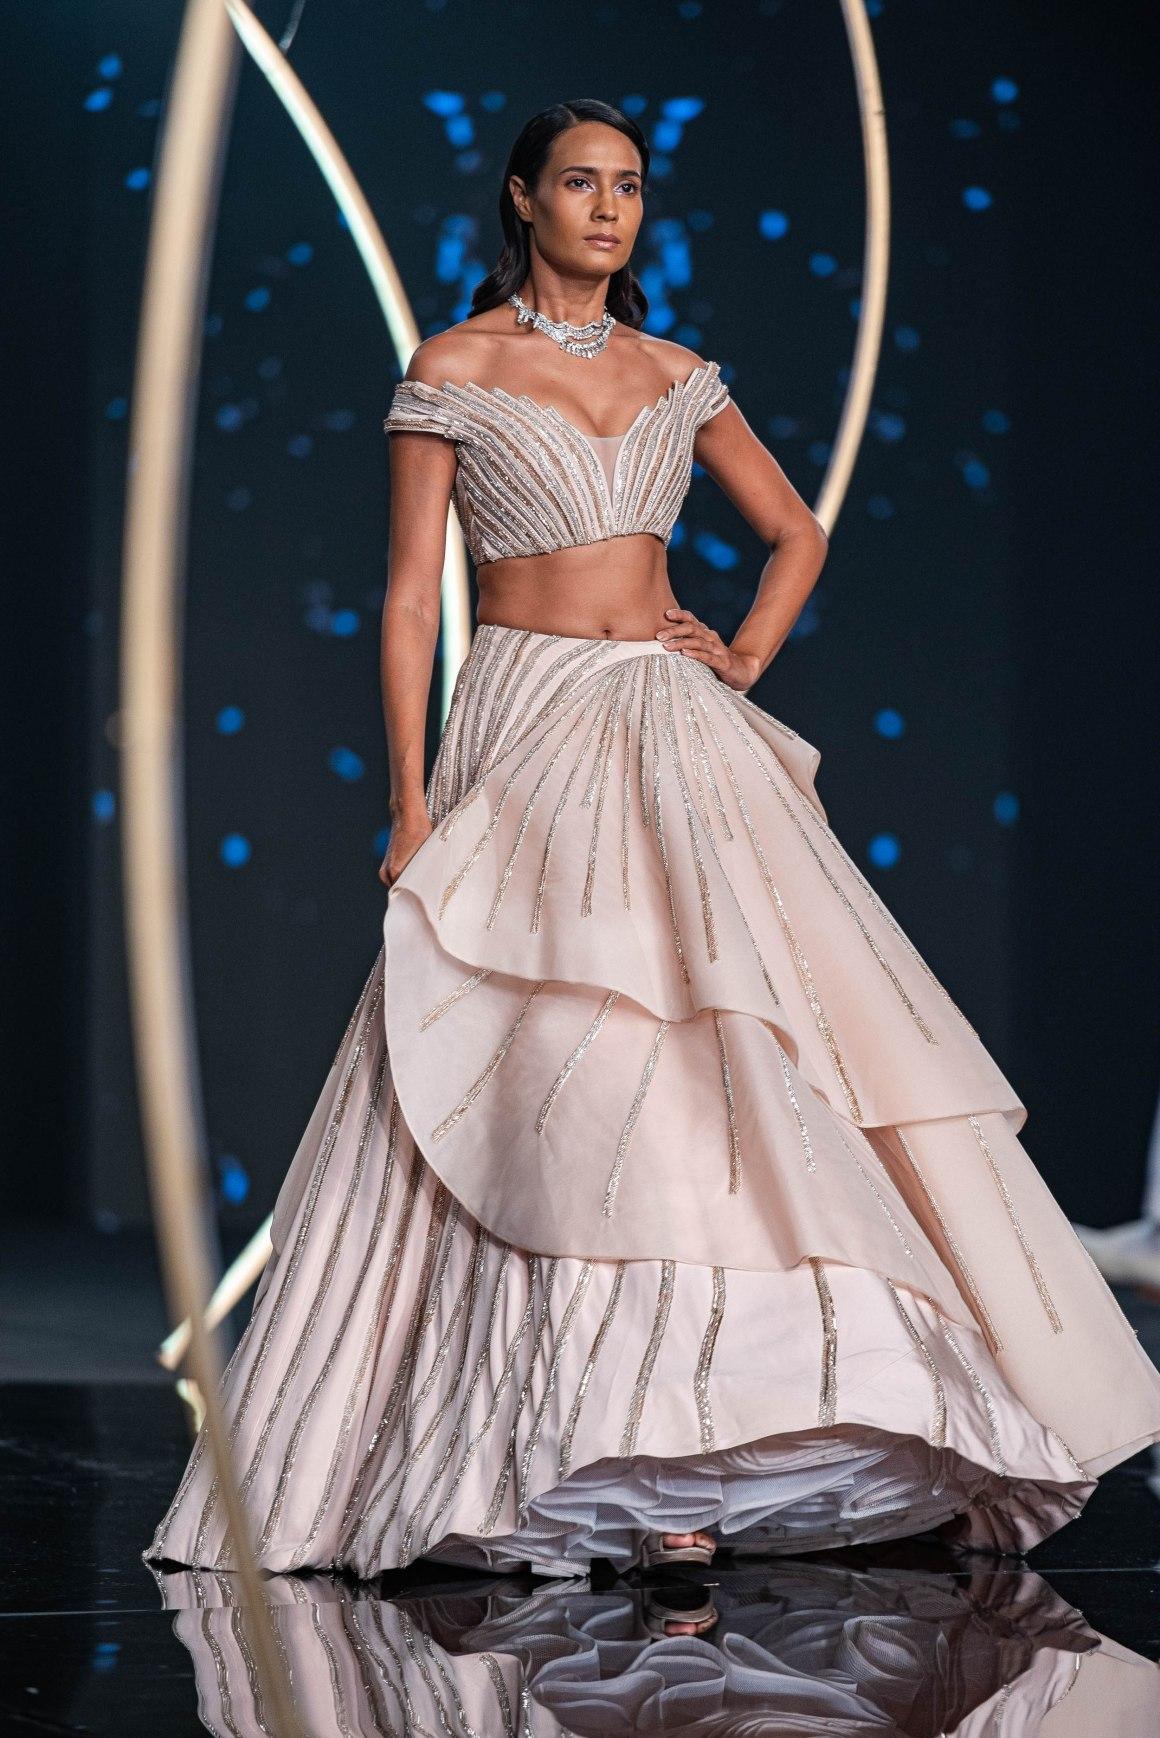 #EyesForFashion, Close Up Couture, Couture Close Up, couture week, fashion blogger, Fashion Design Council of India, fashion photographer, Fashion Week, Fashion Week Photographer, ICW2019, india couture week 2019, indian couture, lifestyle blogger, lifestyle photographer, luxury blogger, luxury photographer, Made In India, naina redhu, naina.co, new delhi, photo blogger, Runway Photographer, Taj Palace New Delhi, The FDCI, the voice of fashion, TVoF, Gaurav Gupta, Designer Gaurav Gupta, Gaurav Gupta Couture, GGPanther, Diana Penty